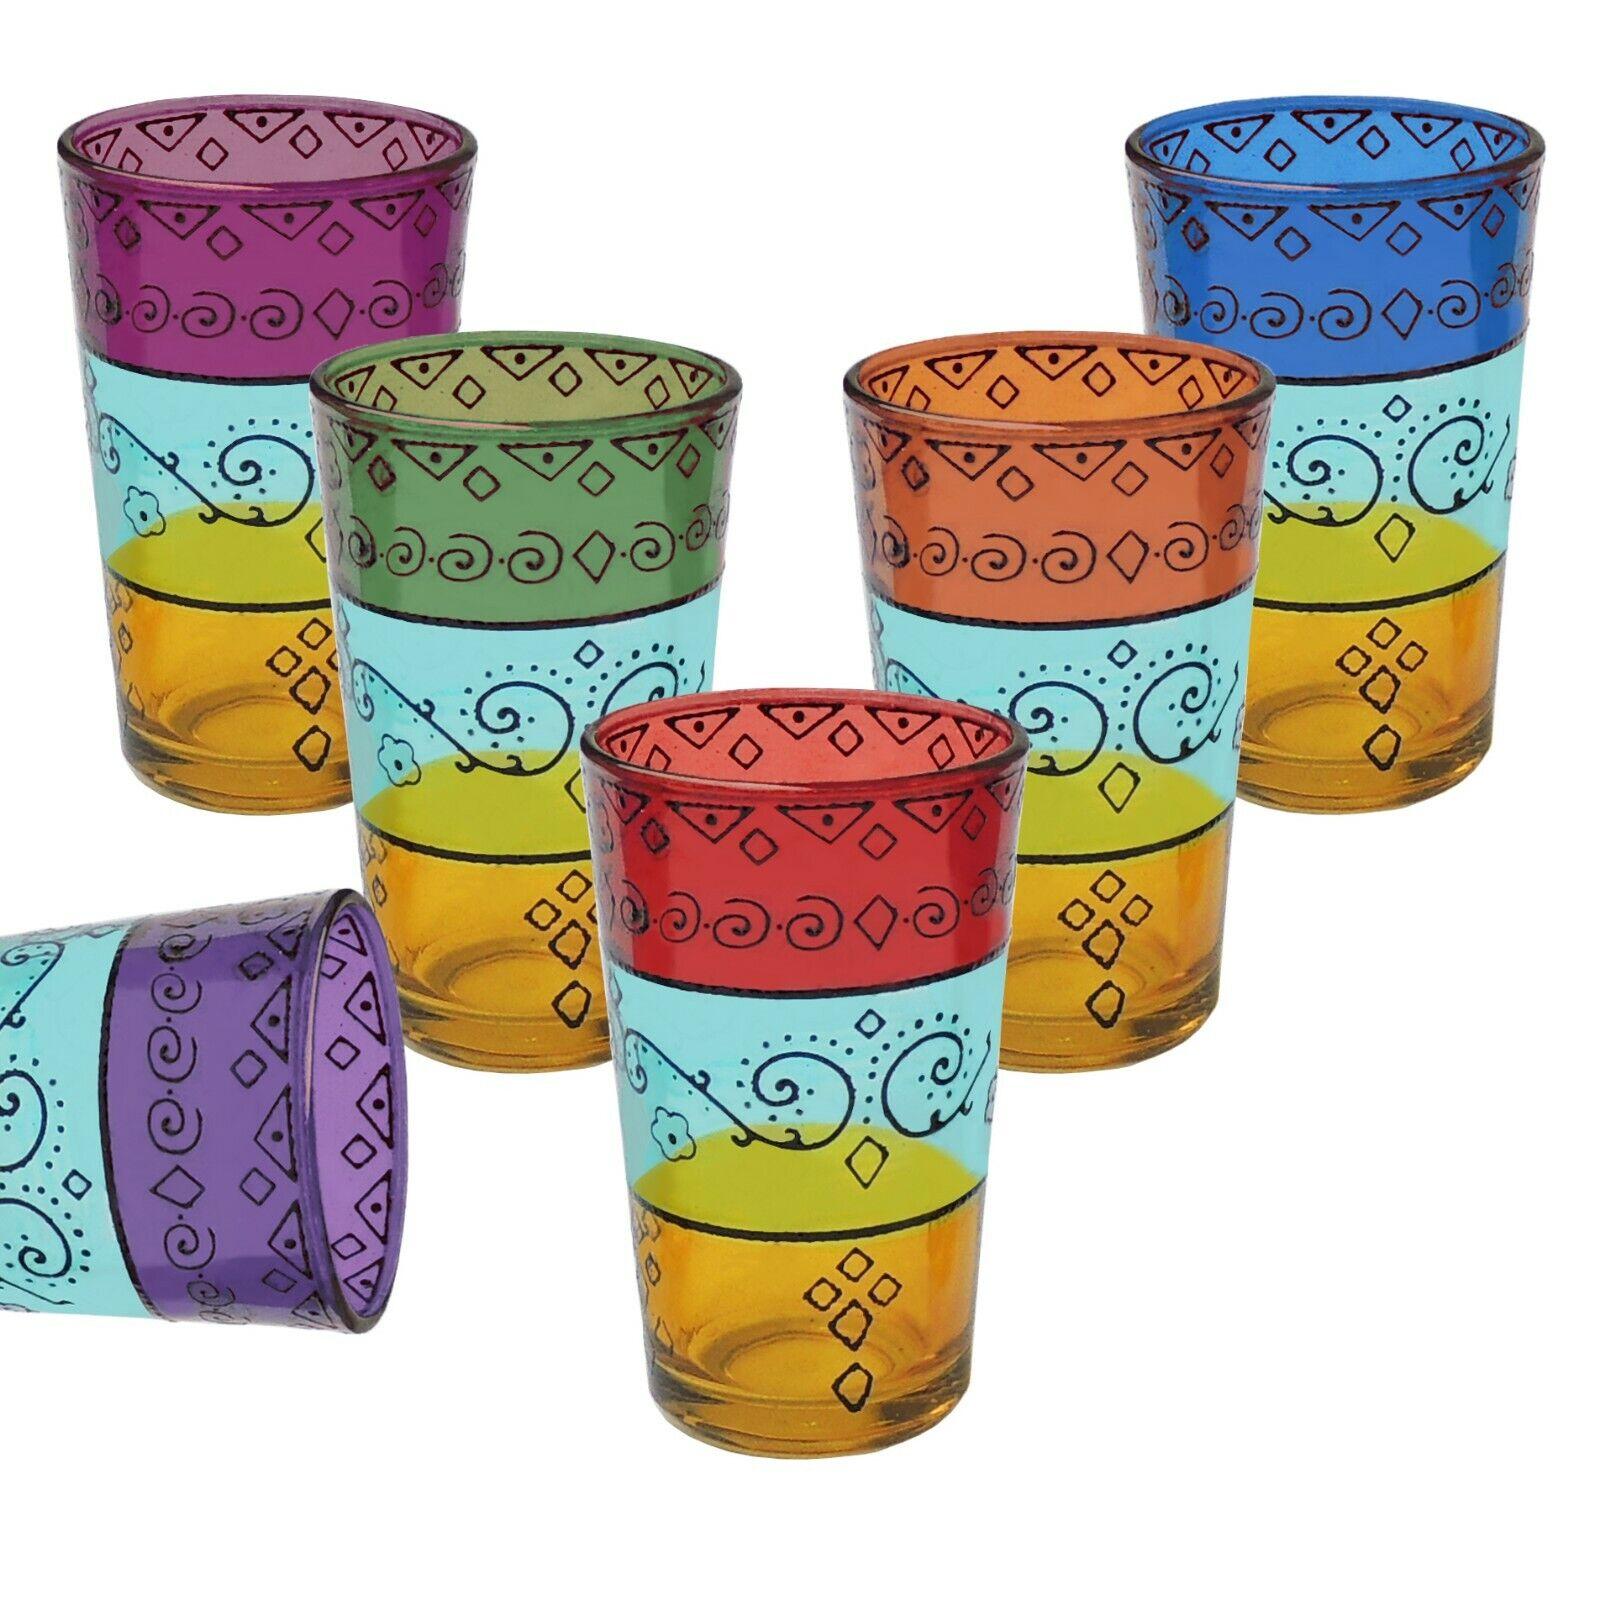 6er Set marokkanische teegläser Alwan - Arabische Orientalische Gläser Orient